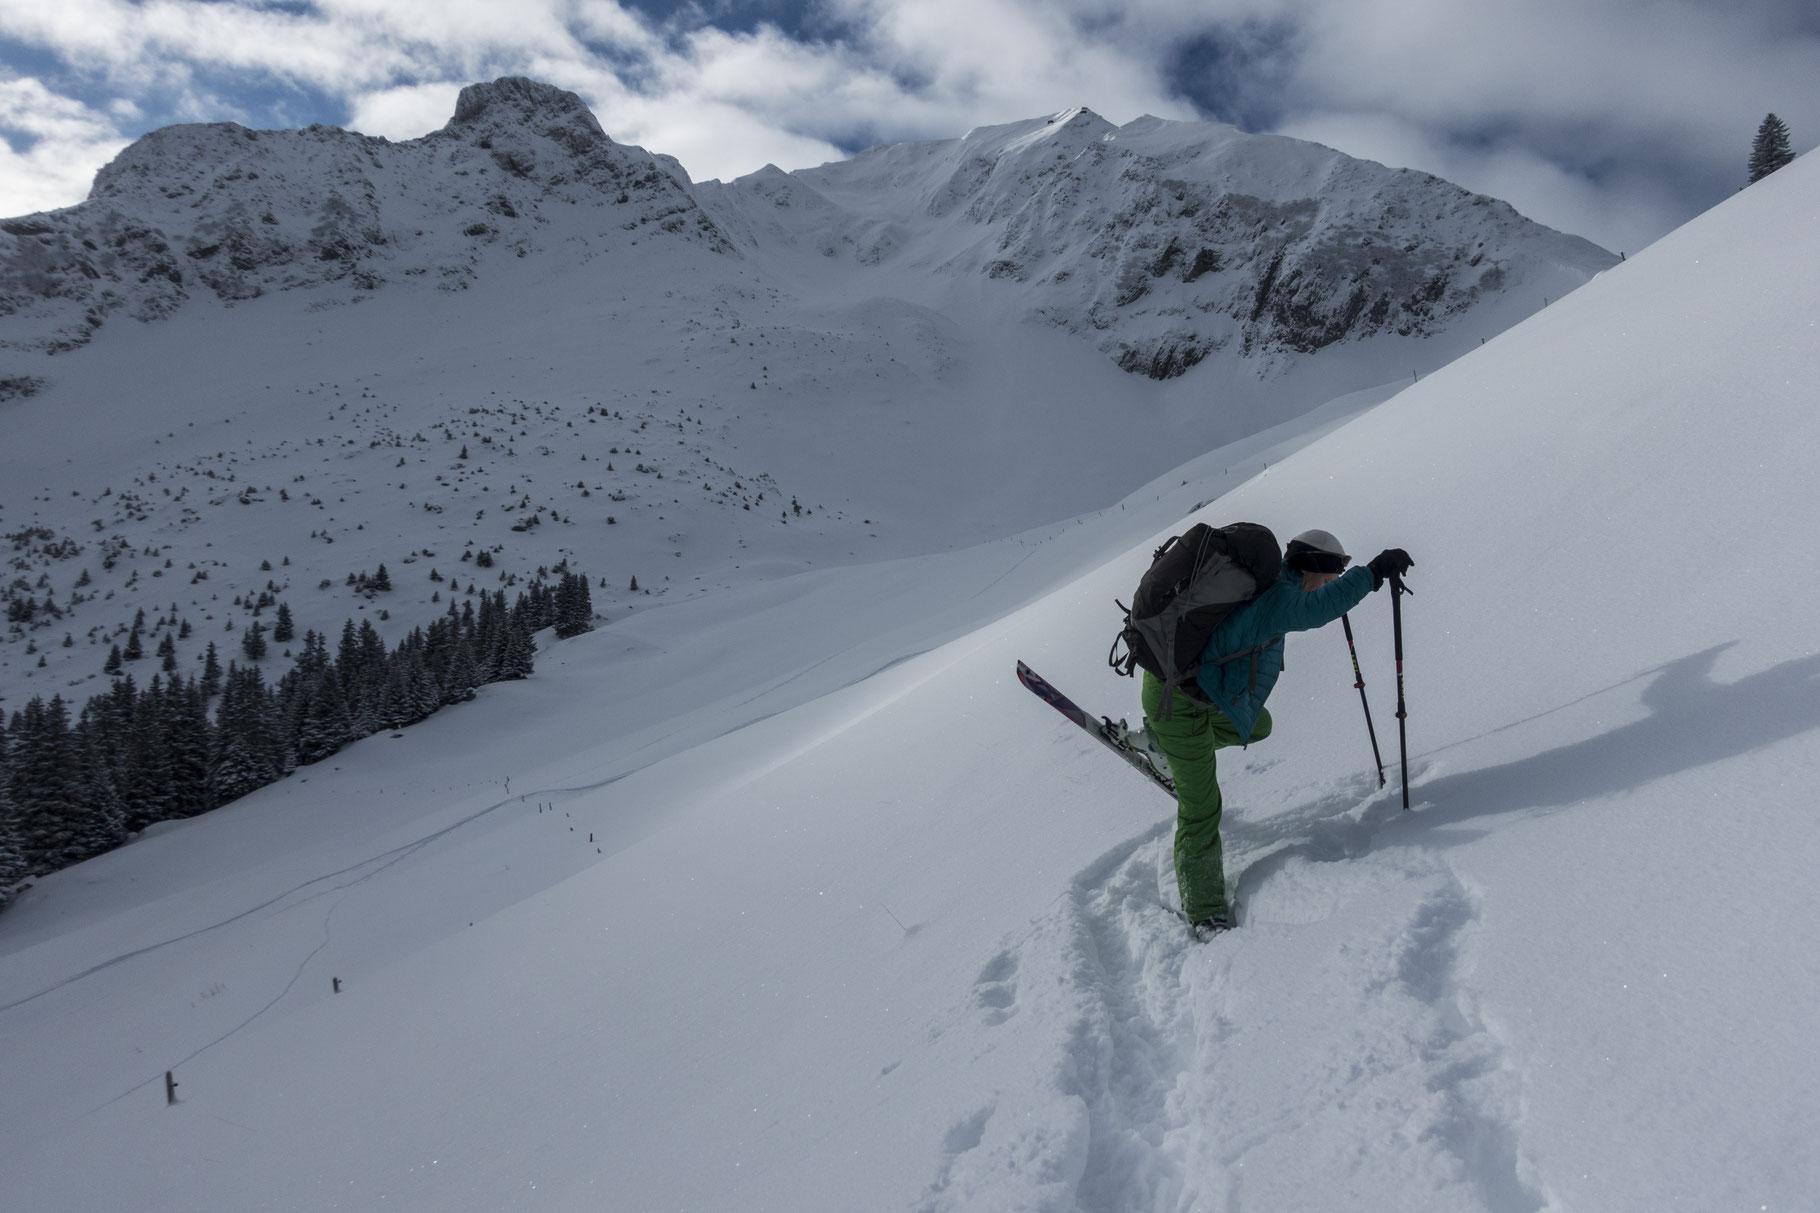 Klettergurt Skitouren : Fels & schnee mountainfokus klettern skitouren fotografie